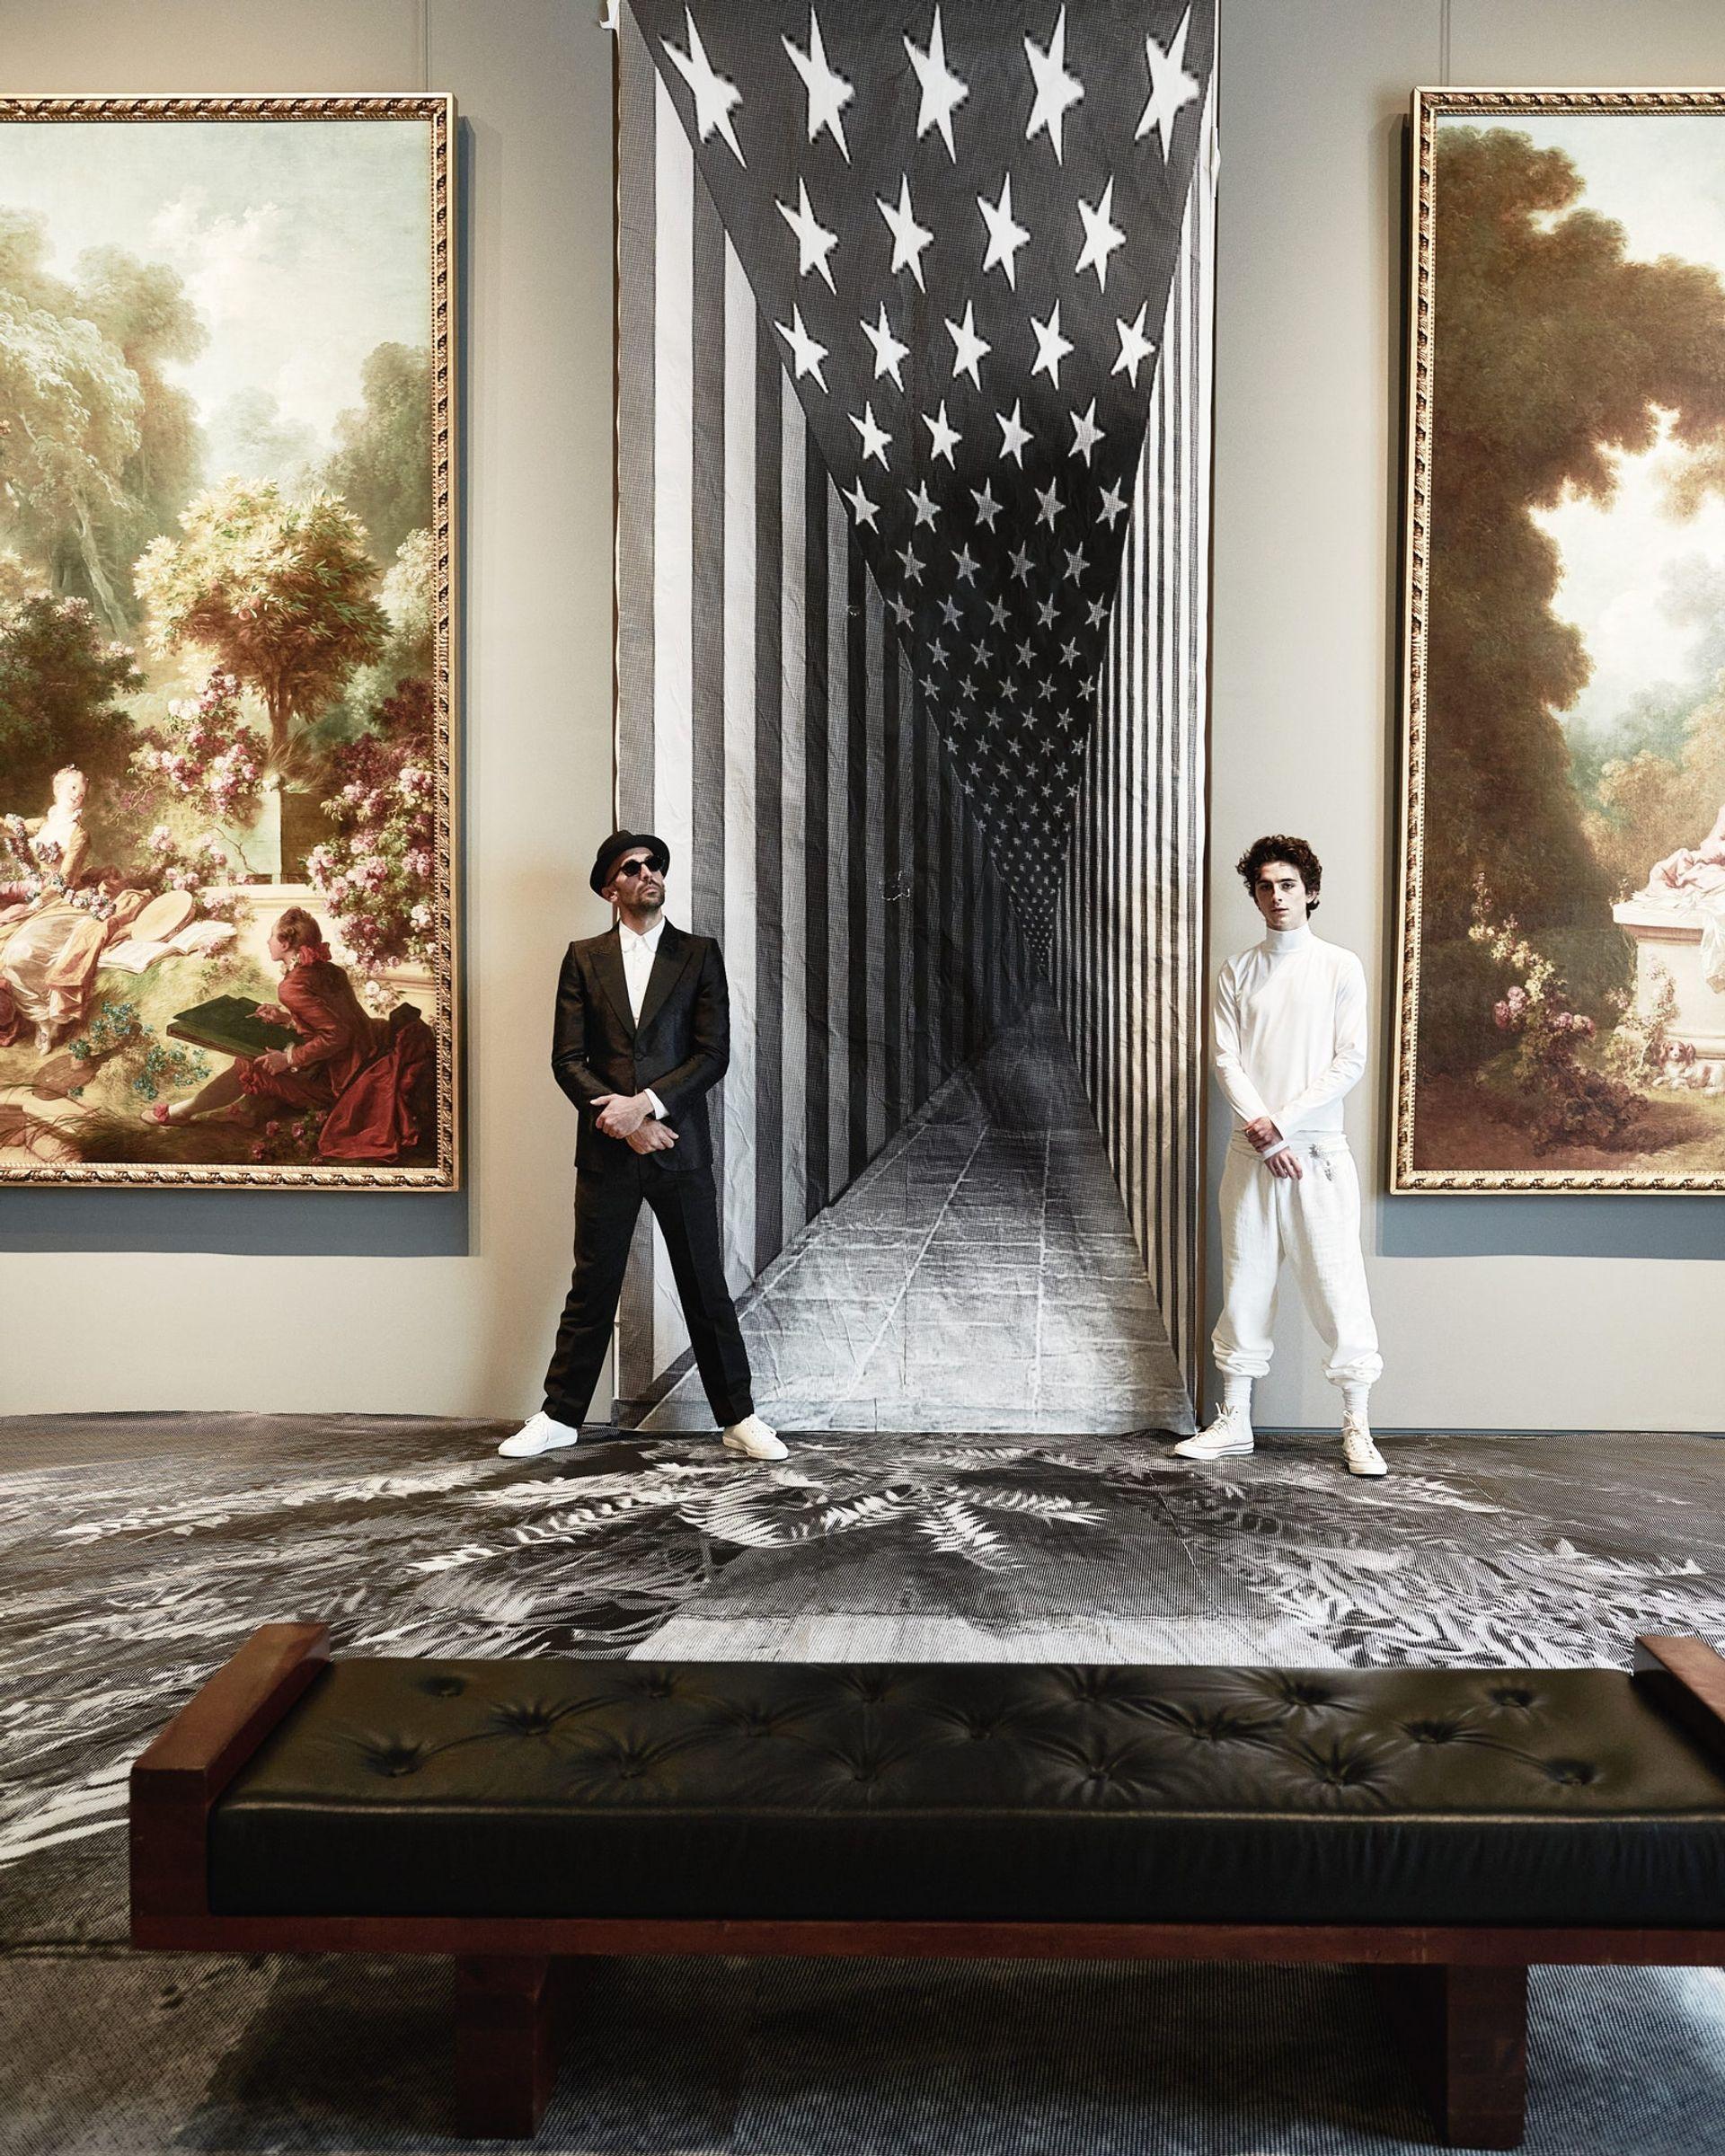 French artist JR and Timothée Chalamet inside the Frick Madison Photo: Julian Ungano